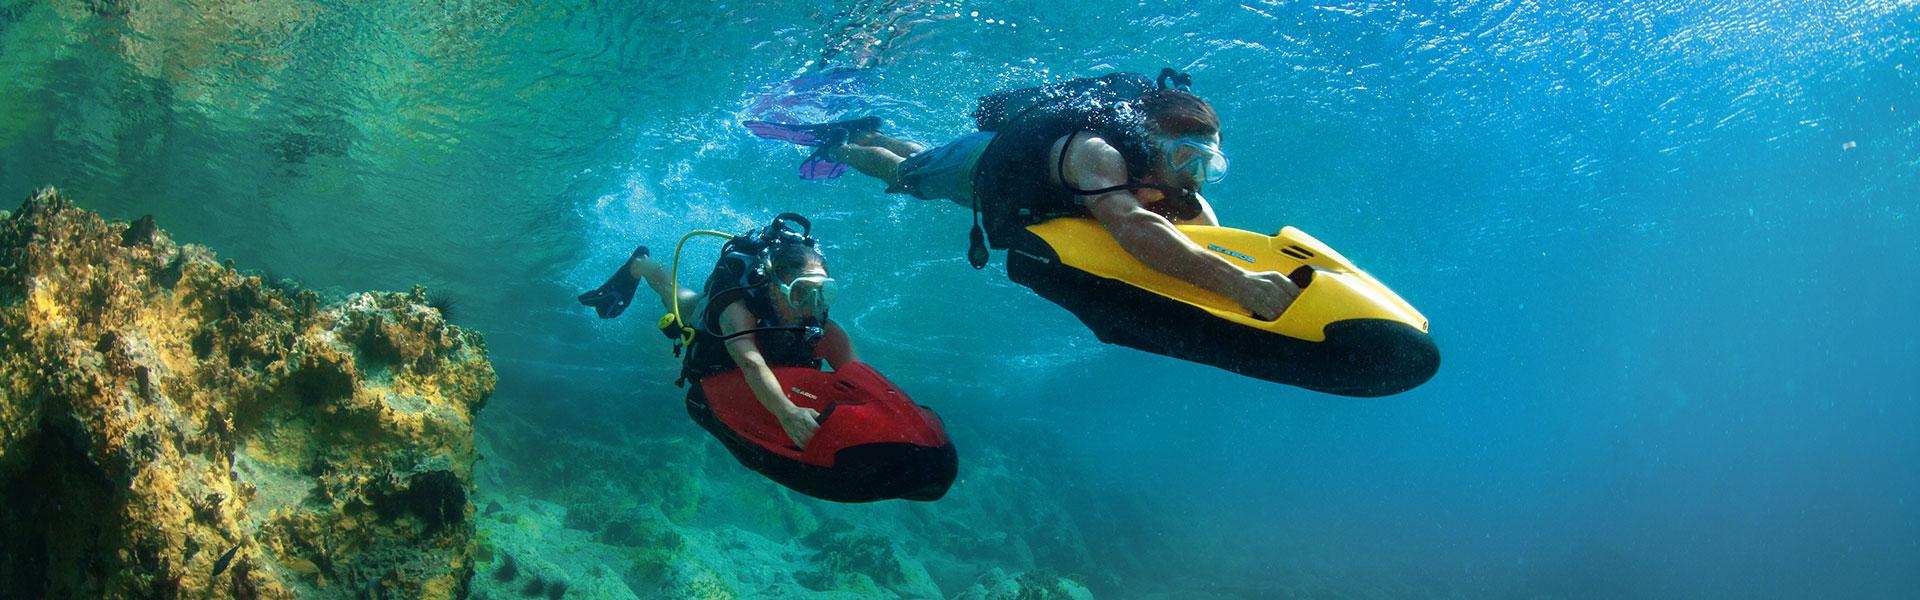 seabob-erlebnis-dive